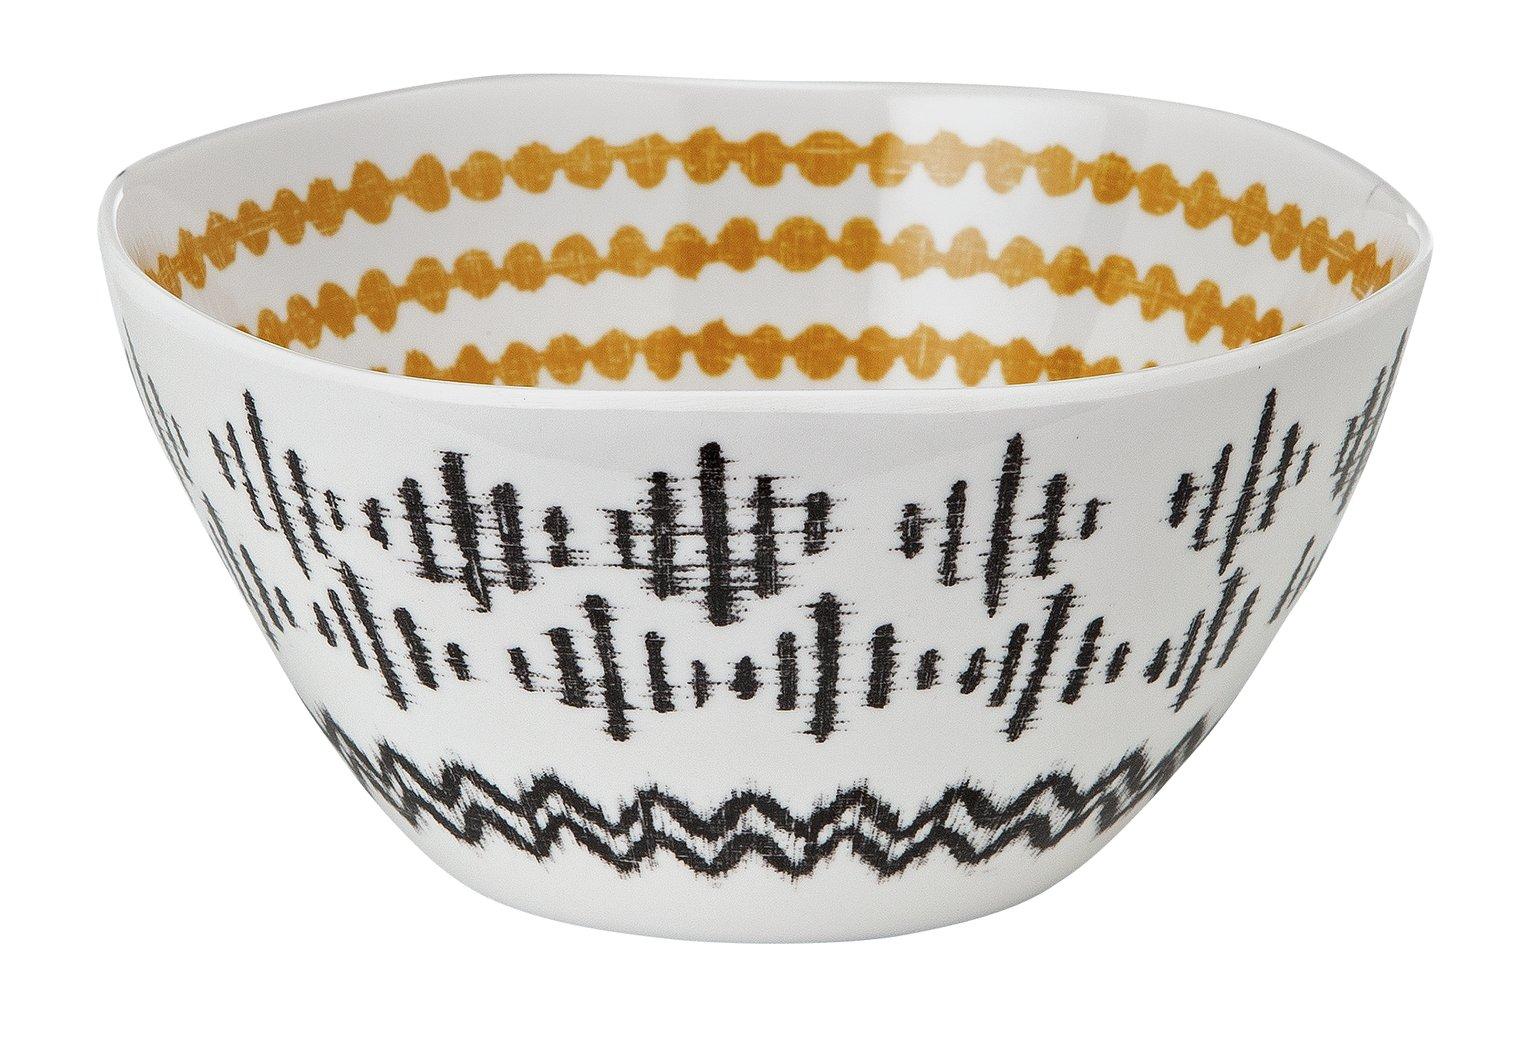 Argos Home Global Monochrome Melamine Cereal Bowls - 4 Pack